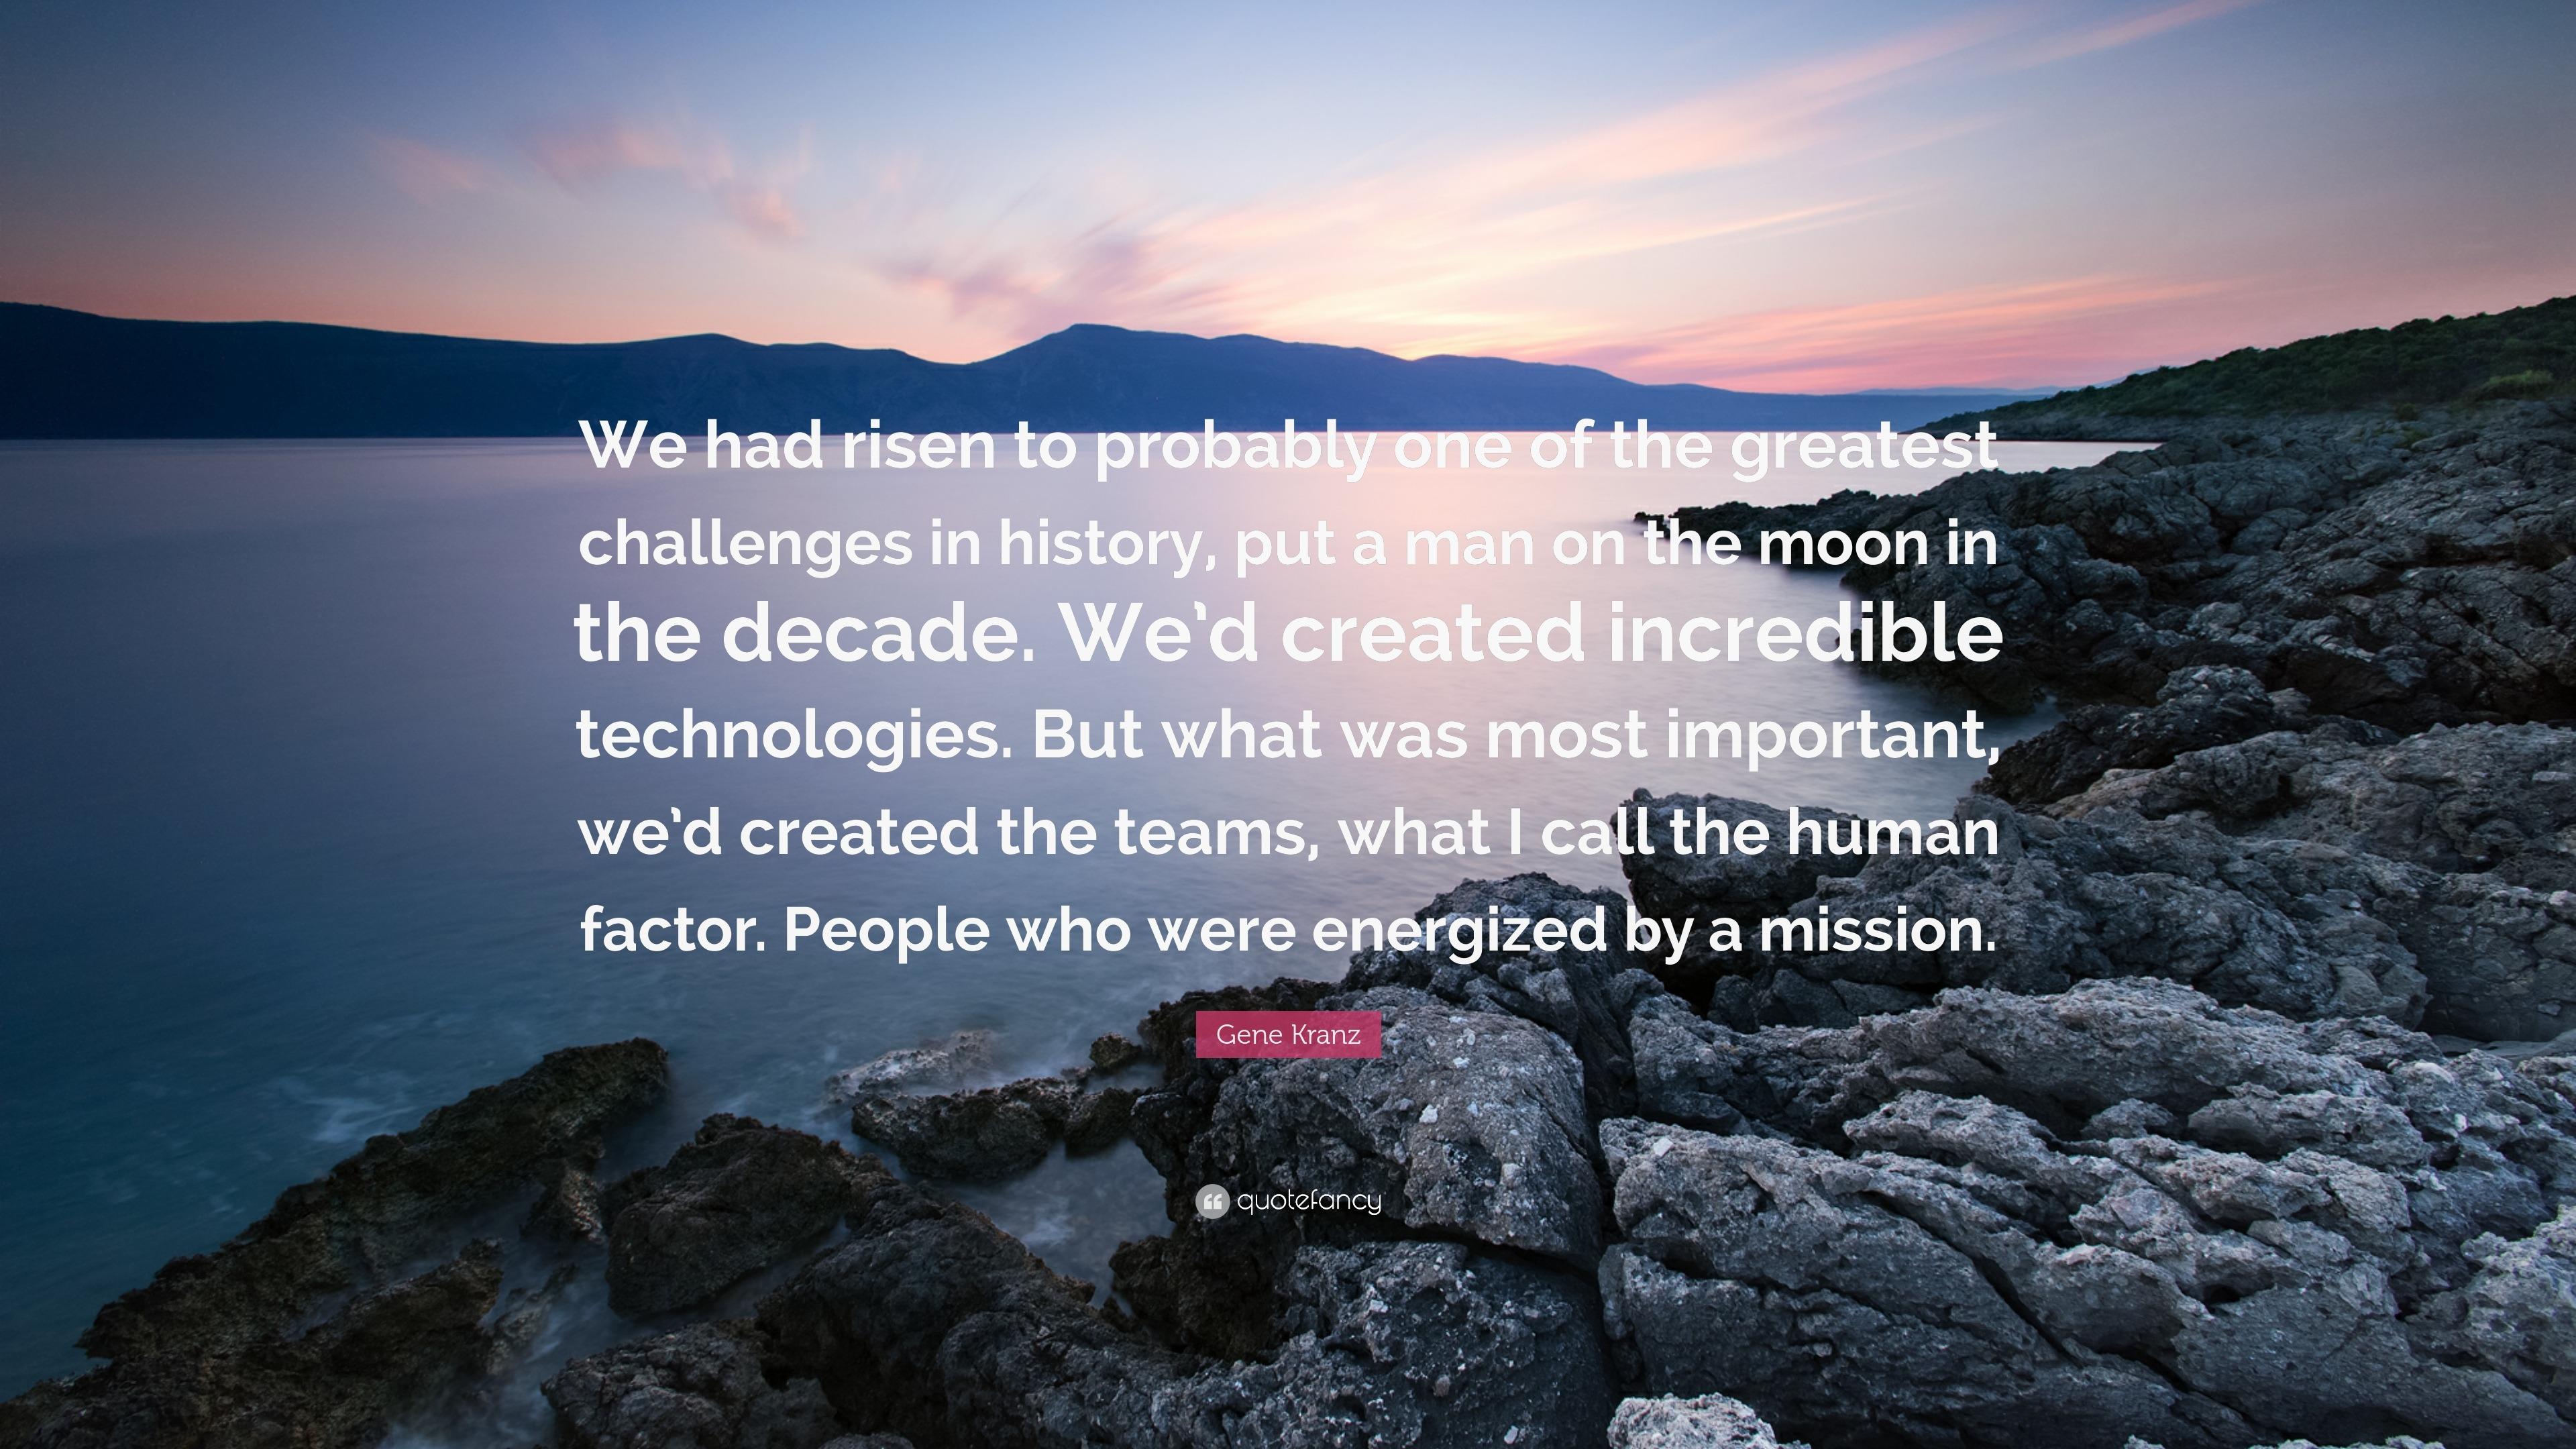 Apollo 13 Quotes Stunning quotesgene kranz quotes gene kranz let's work the problem • hak660